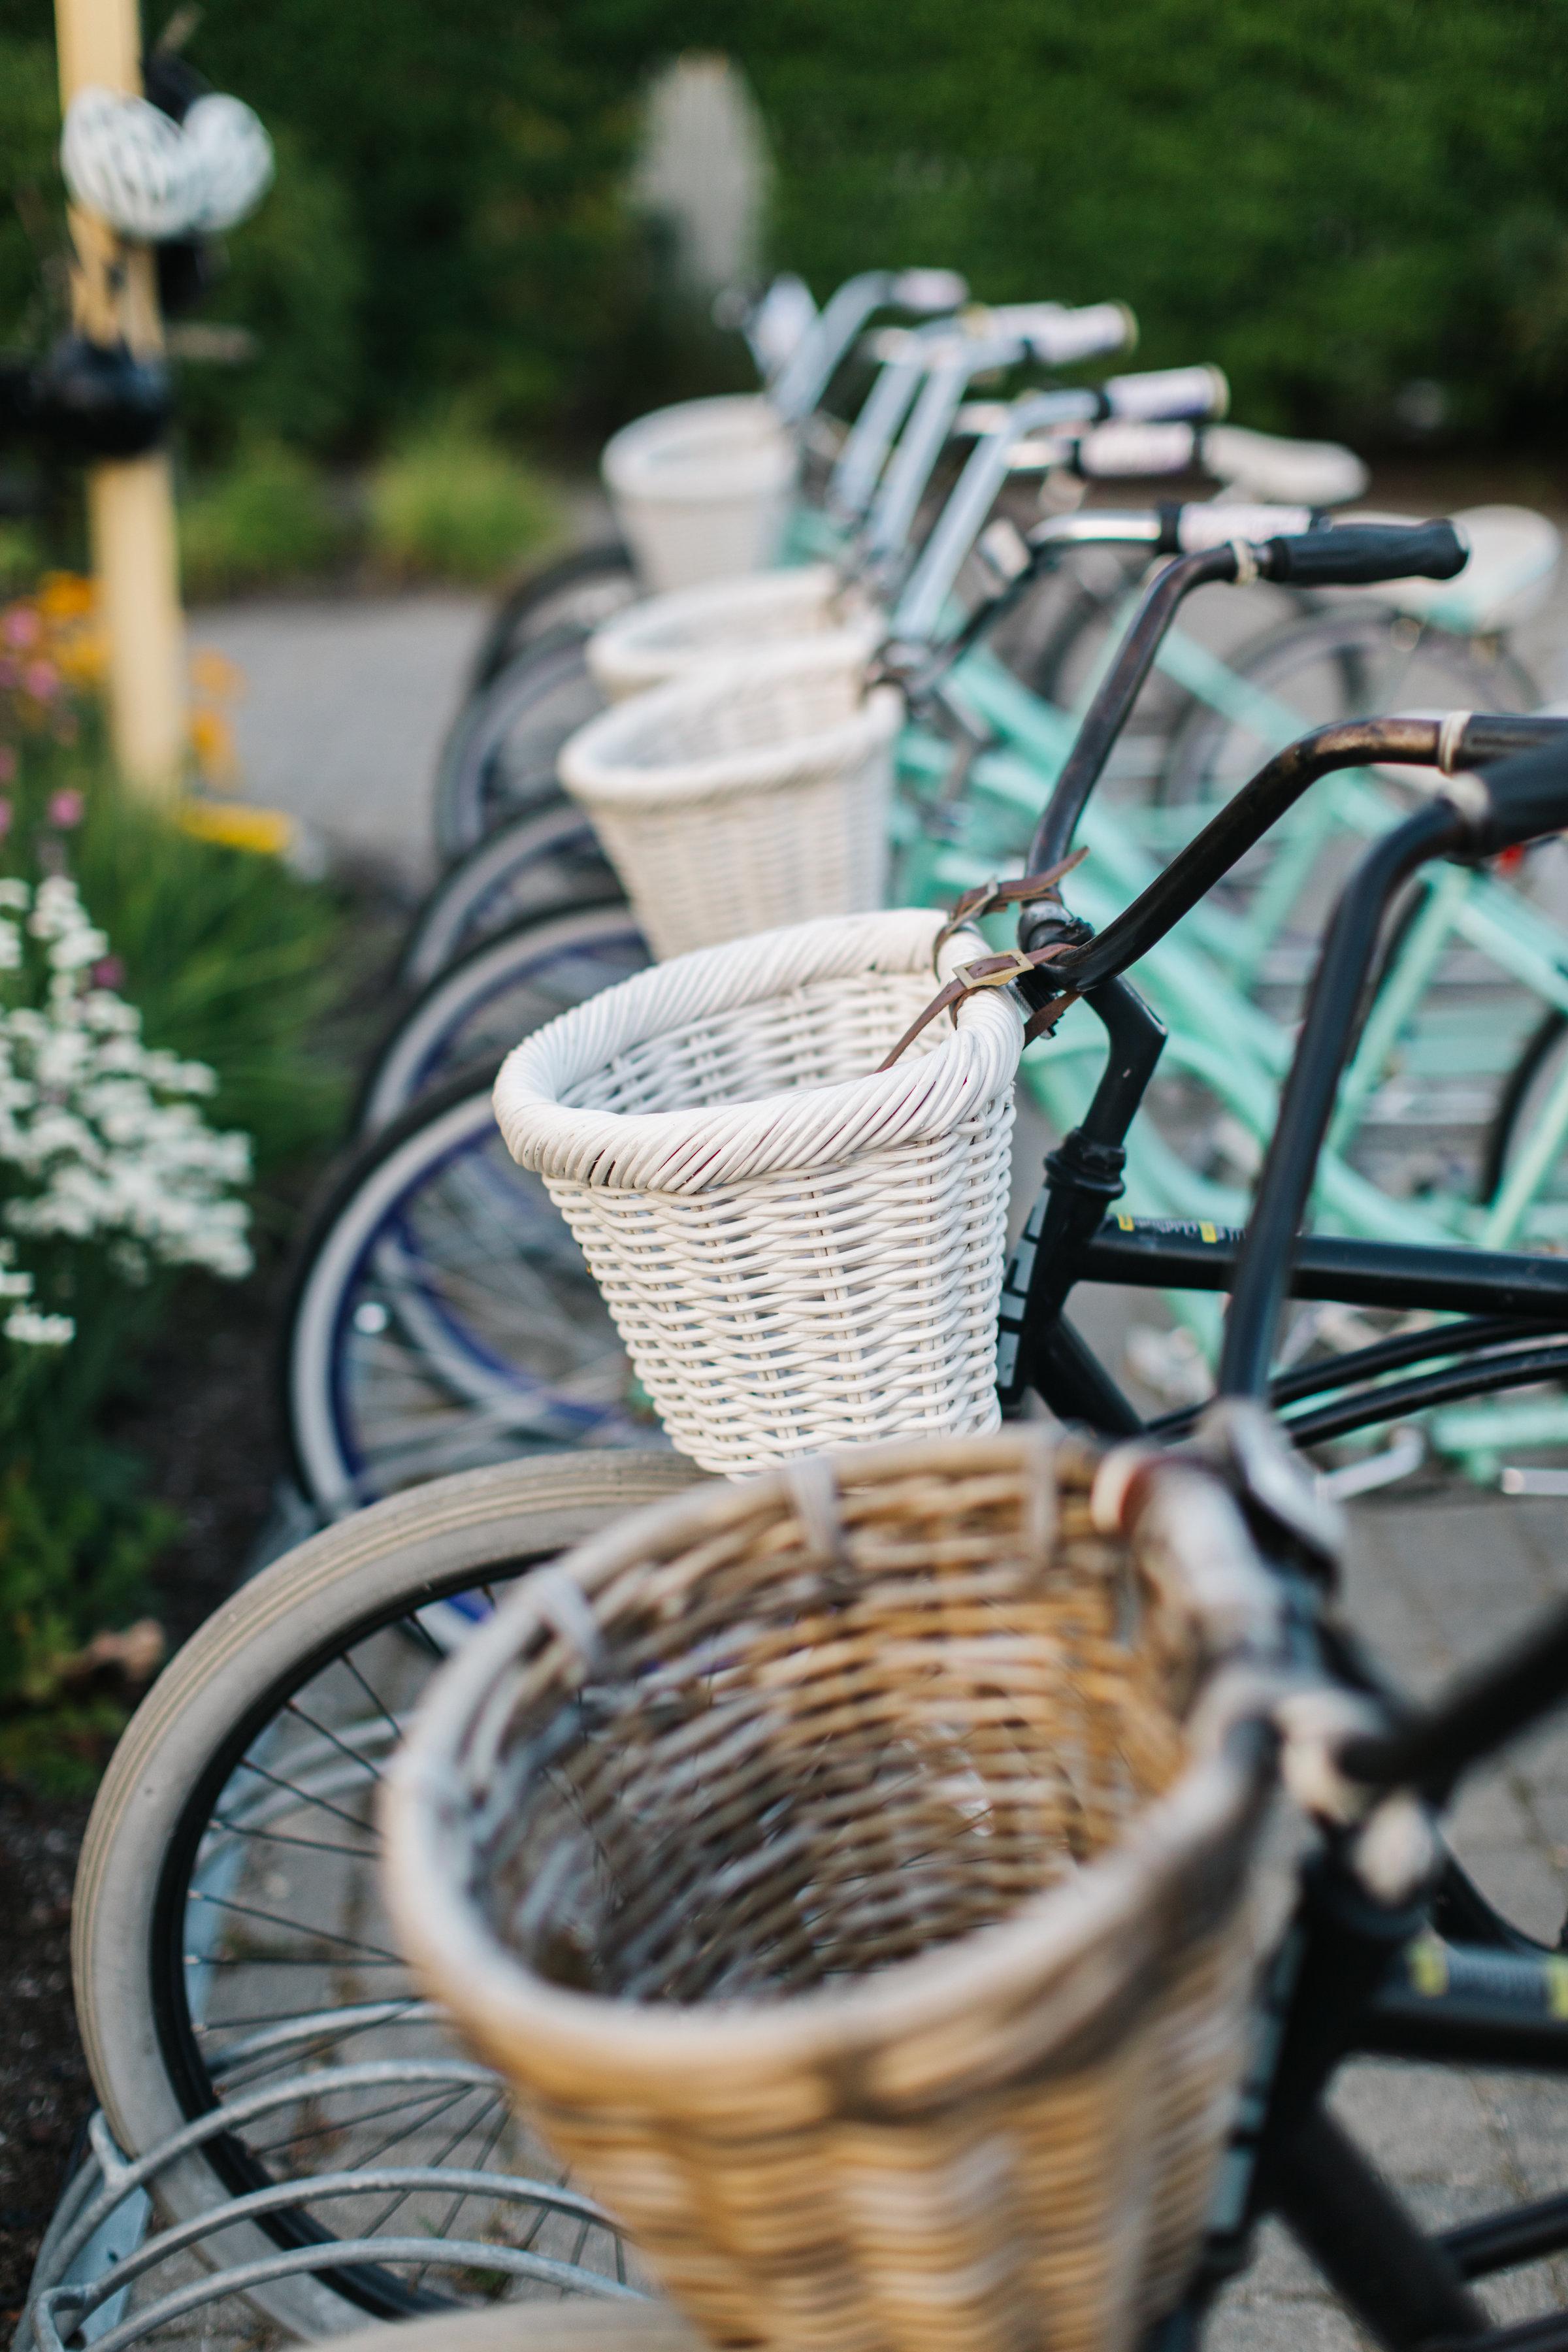 Bikes with woven bicycle baskets on handlebars